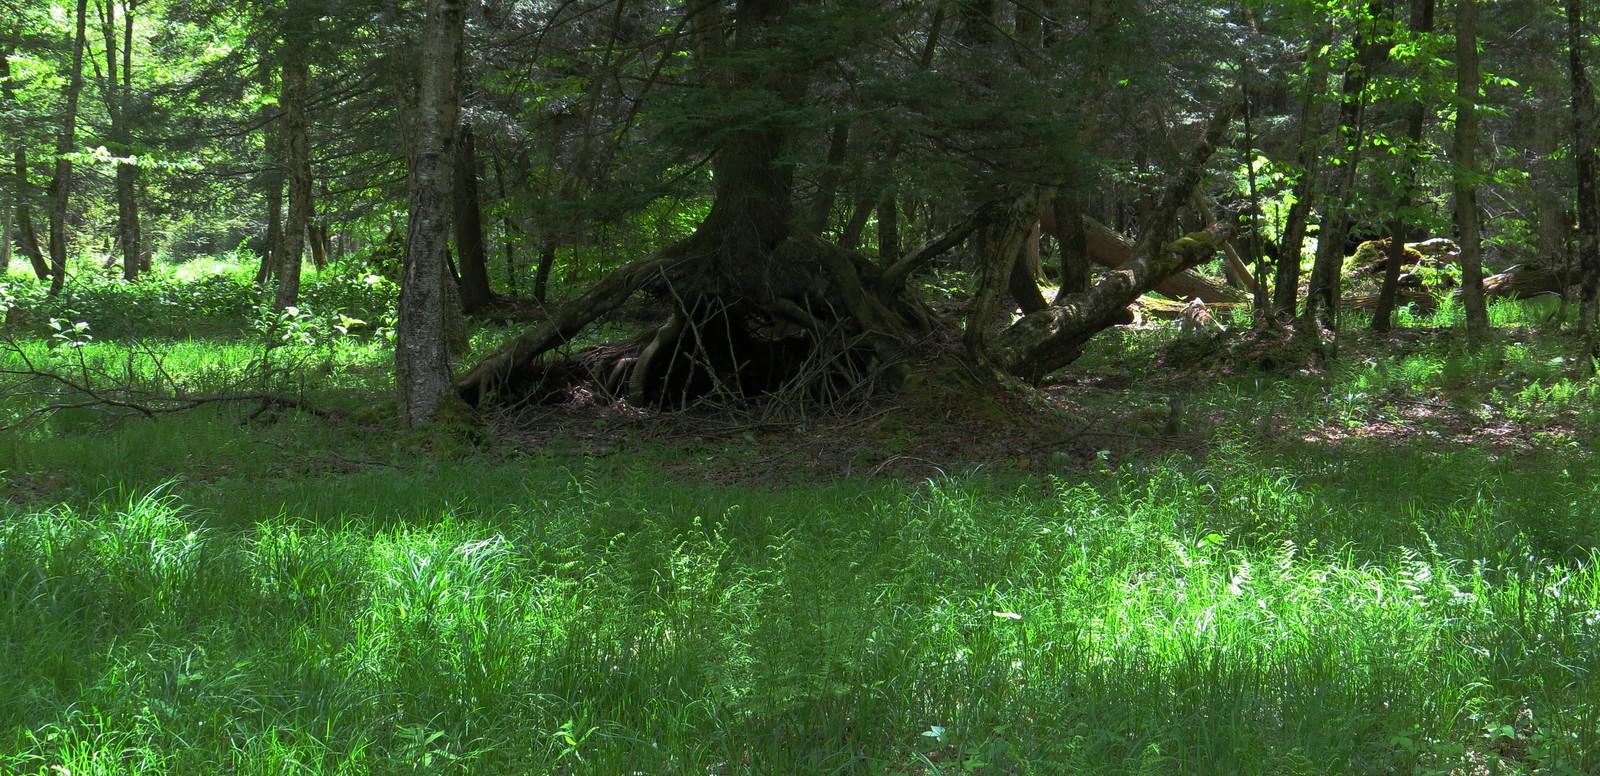 Mongaup Pond, NY